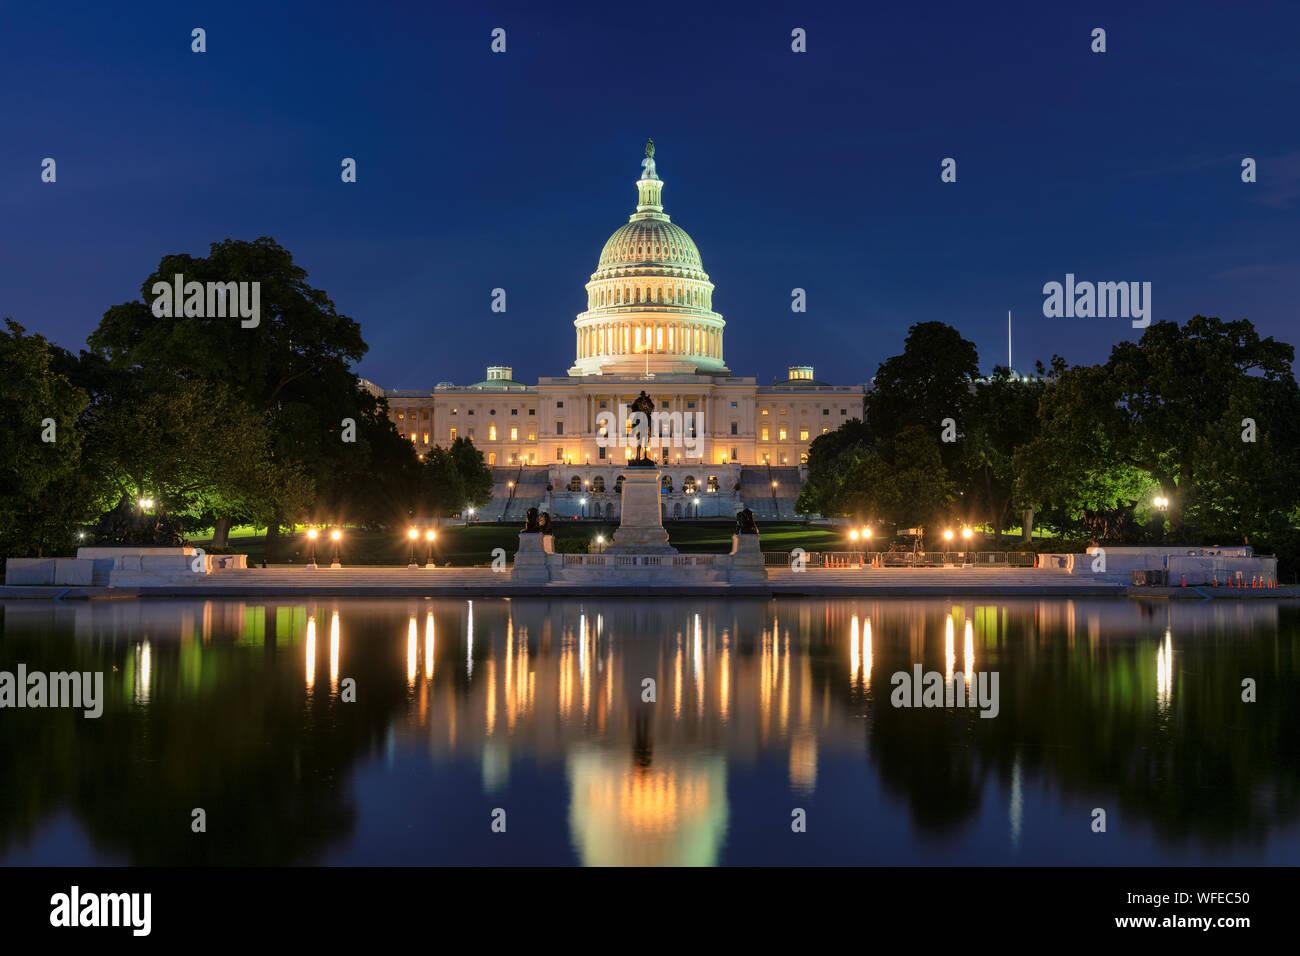 United States Capitol Building di notte Foto Stock